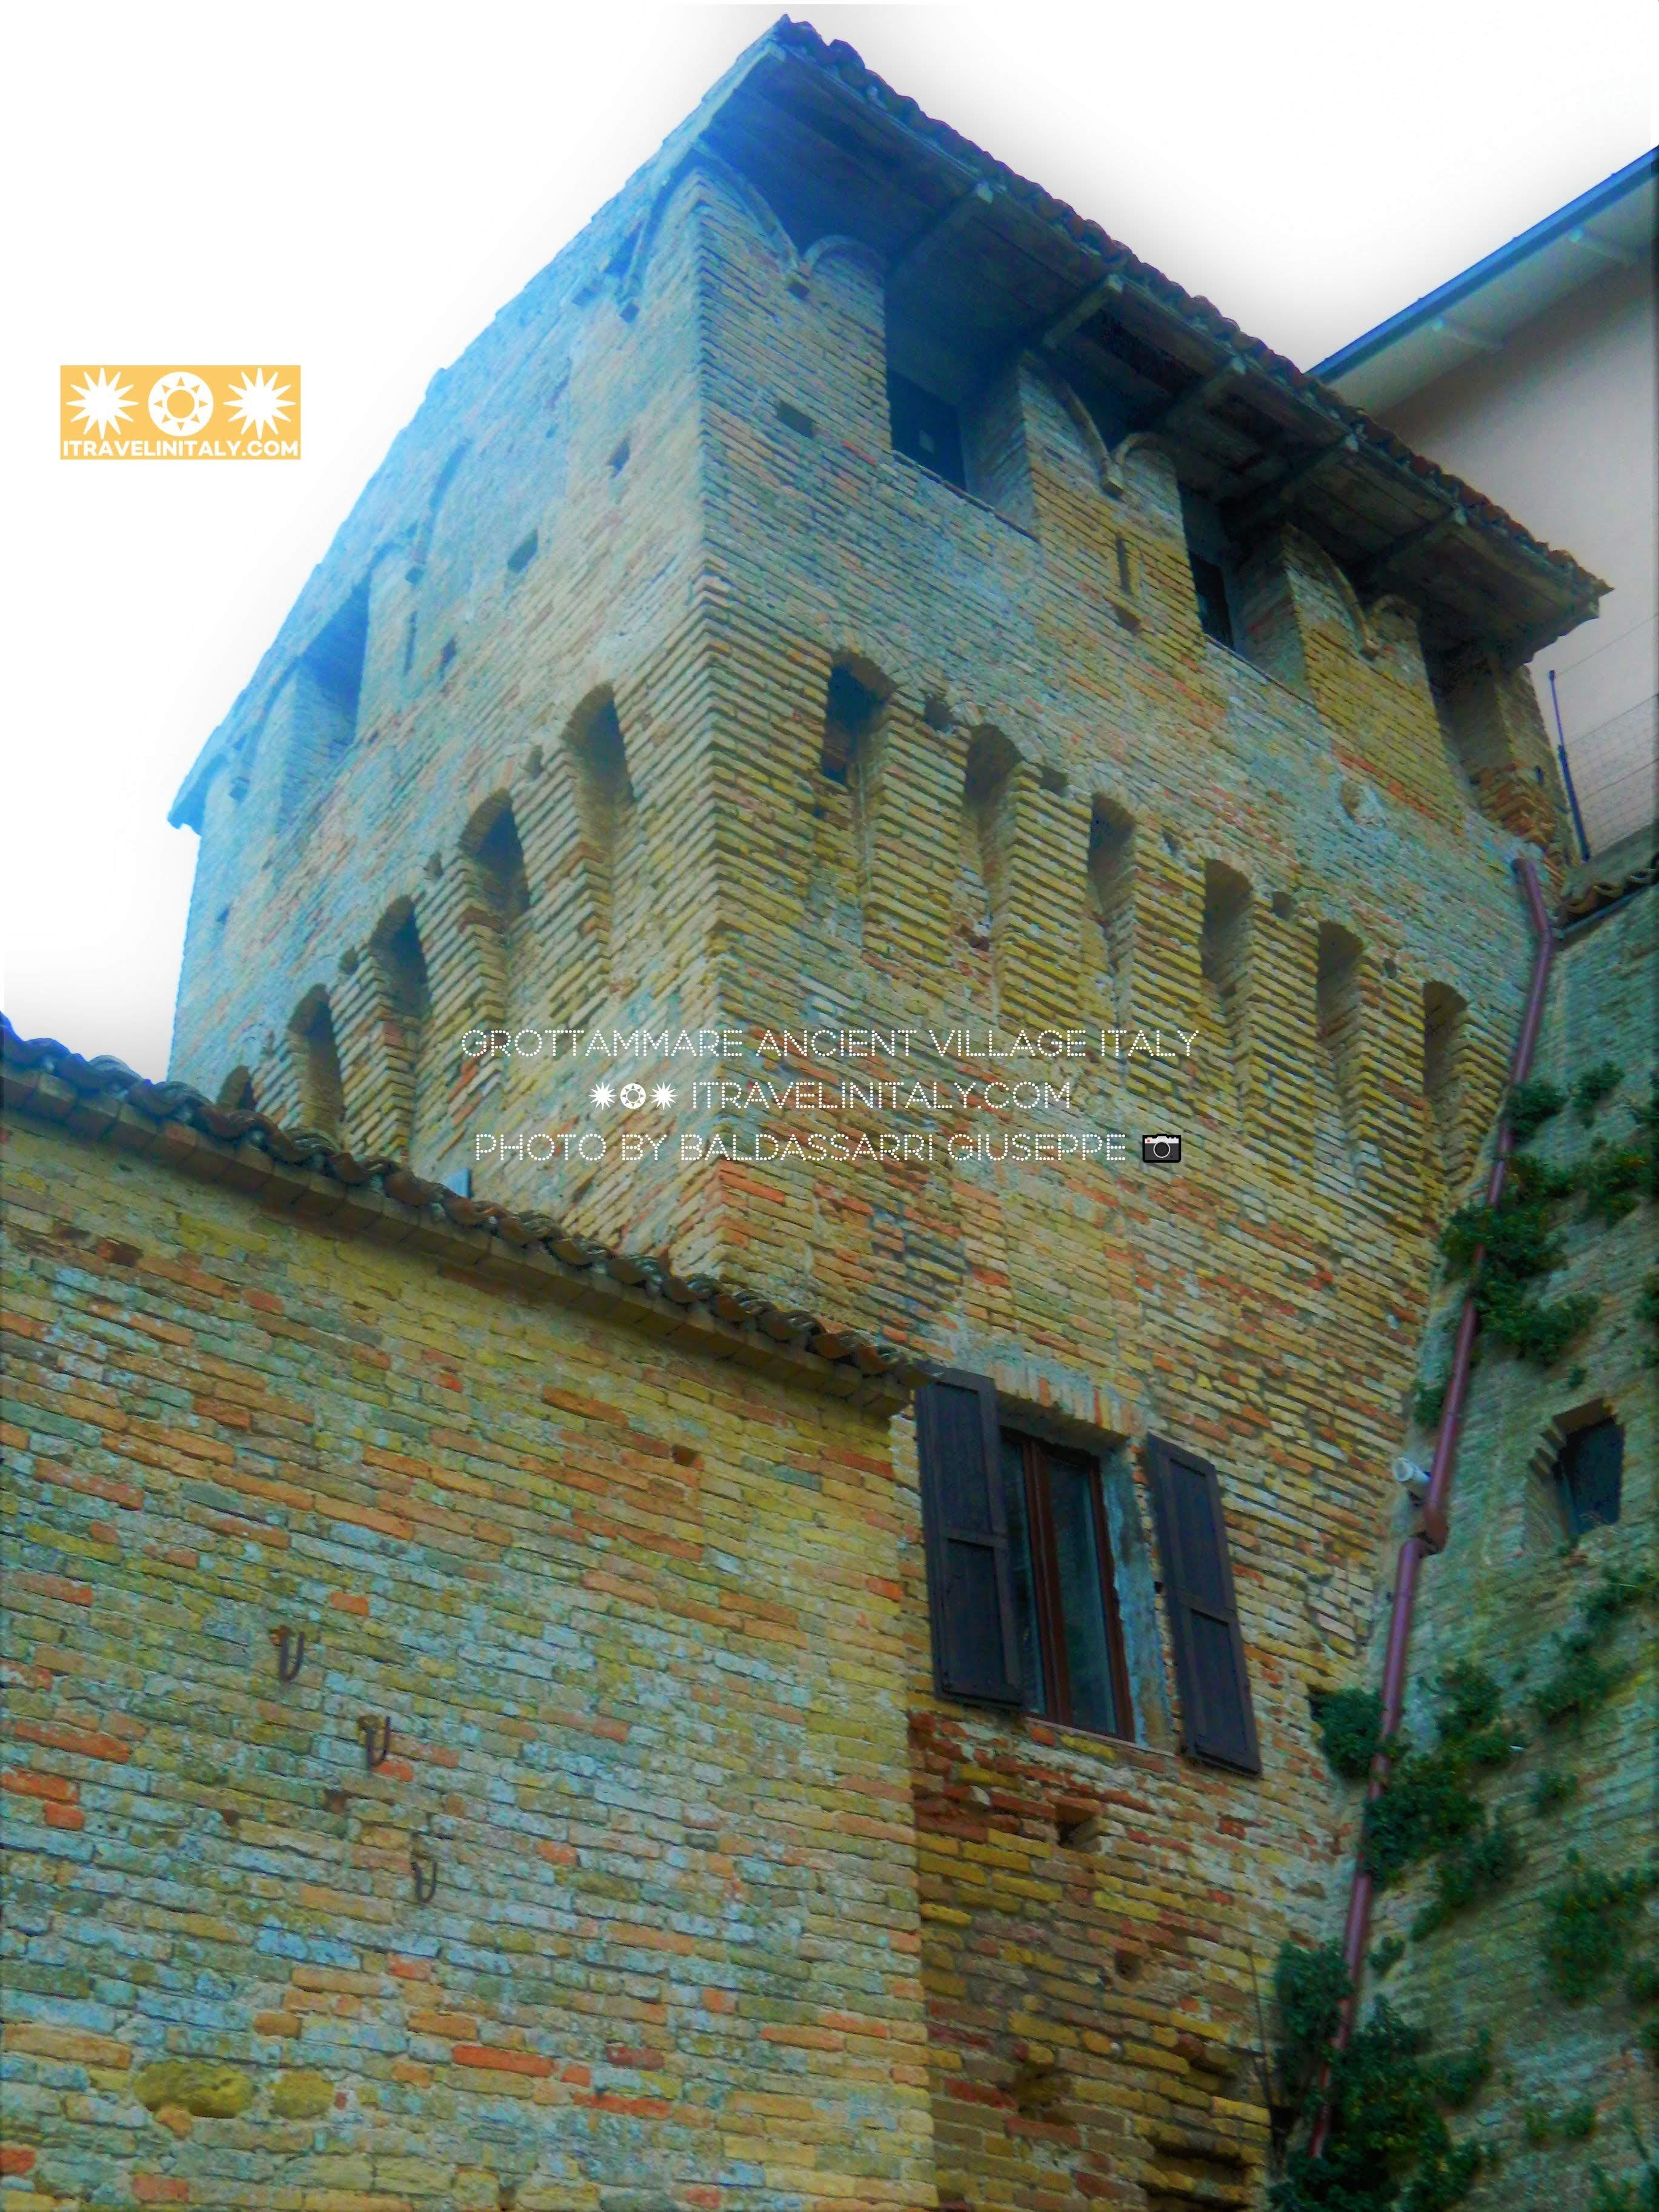 Grottammare ancient village, Via del Castello, 63066 Grottammare AP. Italy itravelinitaly.com By Baldassarri Giuseppe